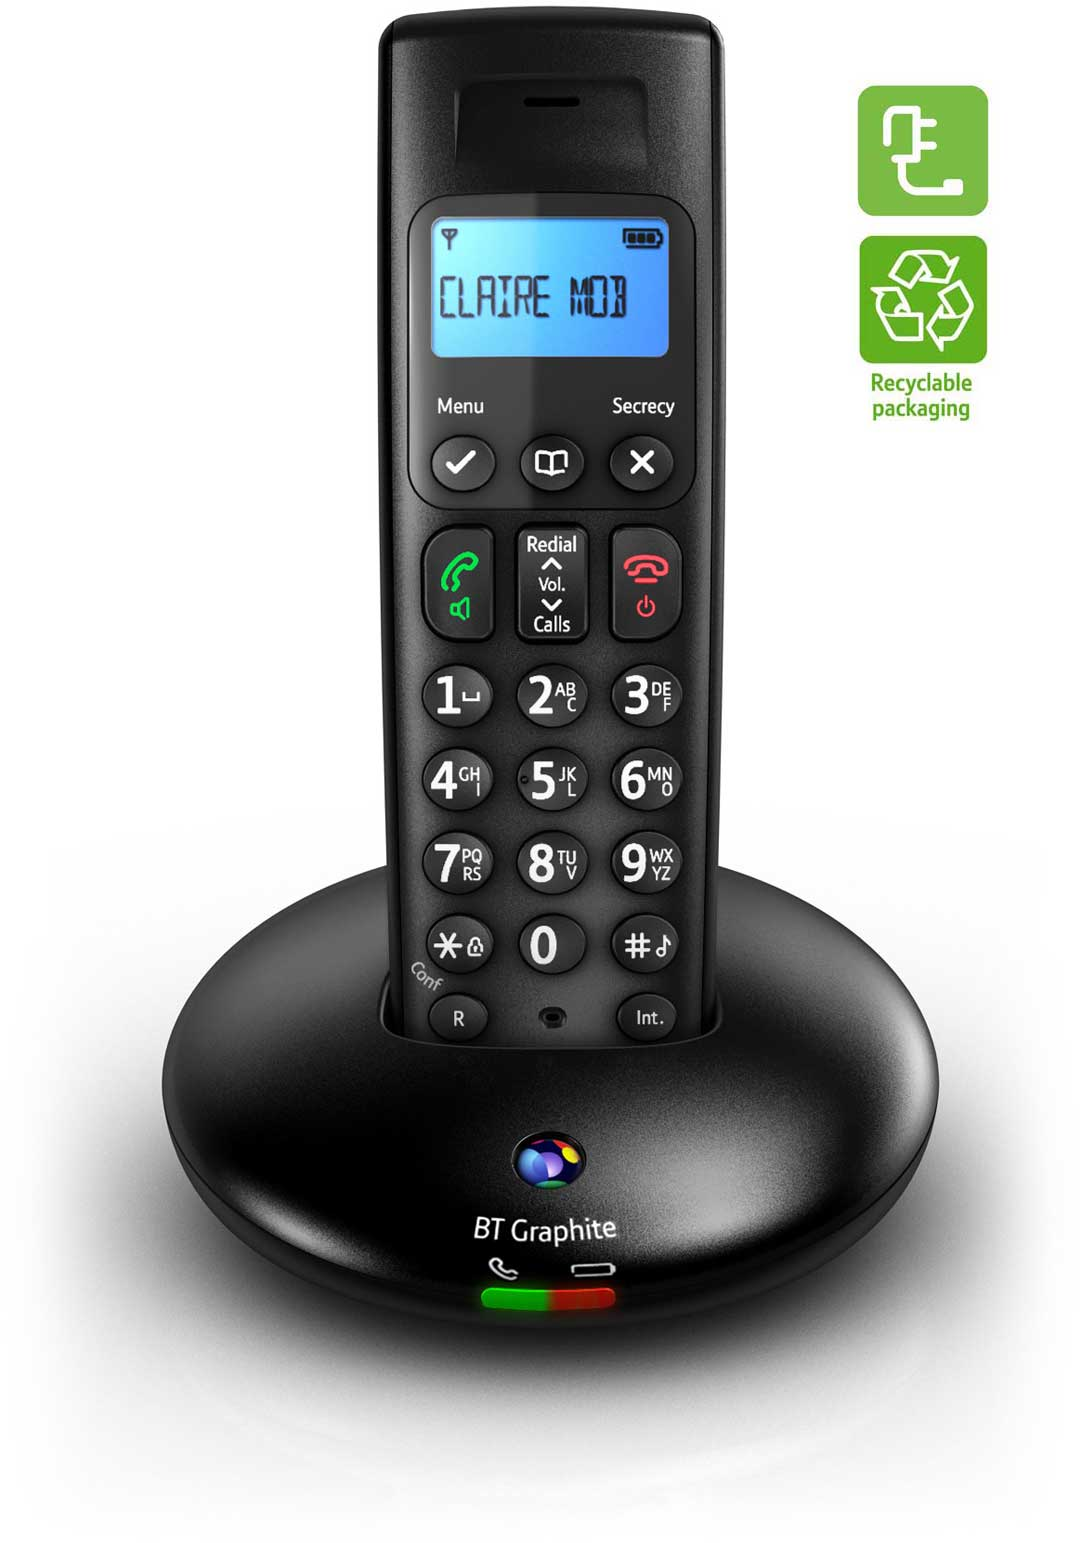 B Graphite 2100 win D Digital ordless Phone: mazon.co.uk ... - ^